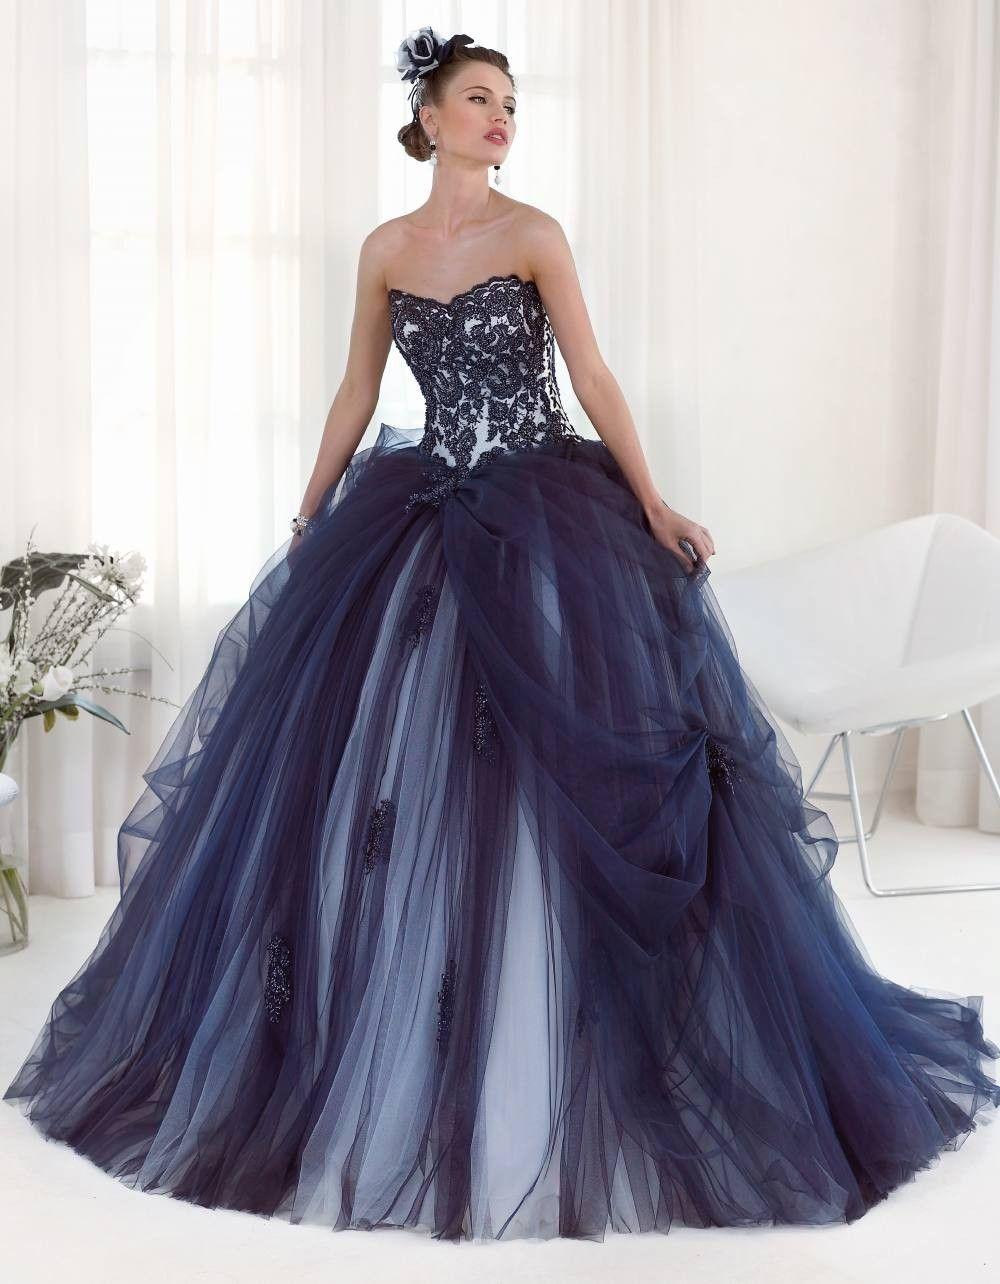 Divina abiti da sposa sposa dream wedding pinterest ball